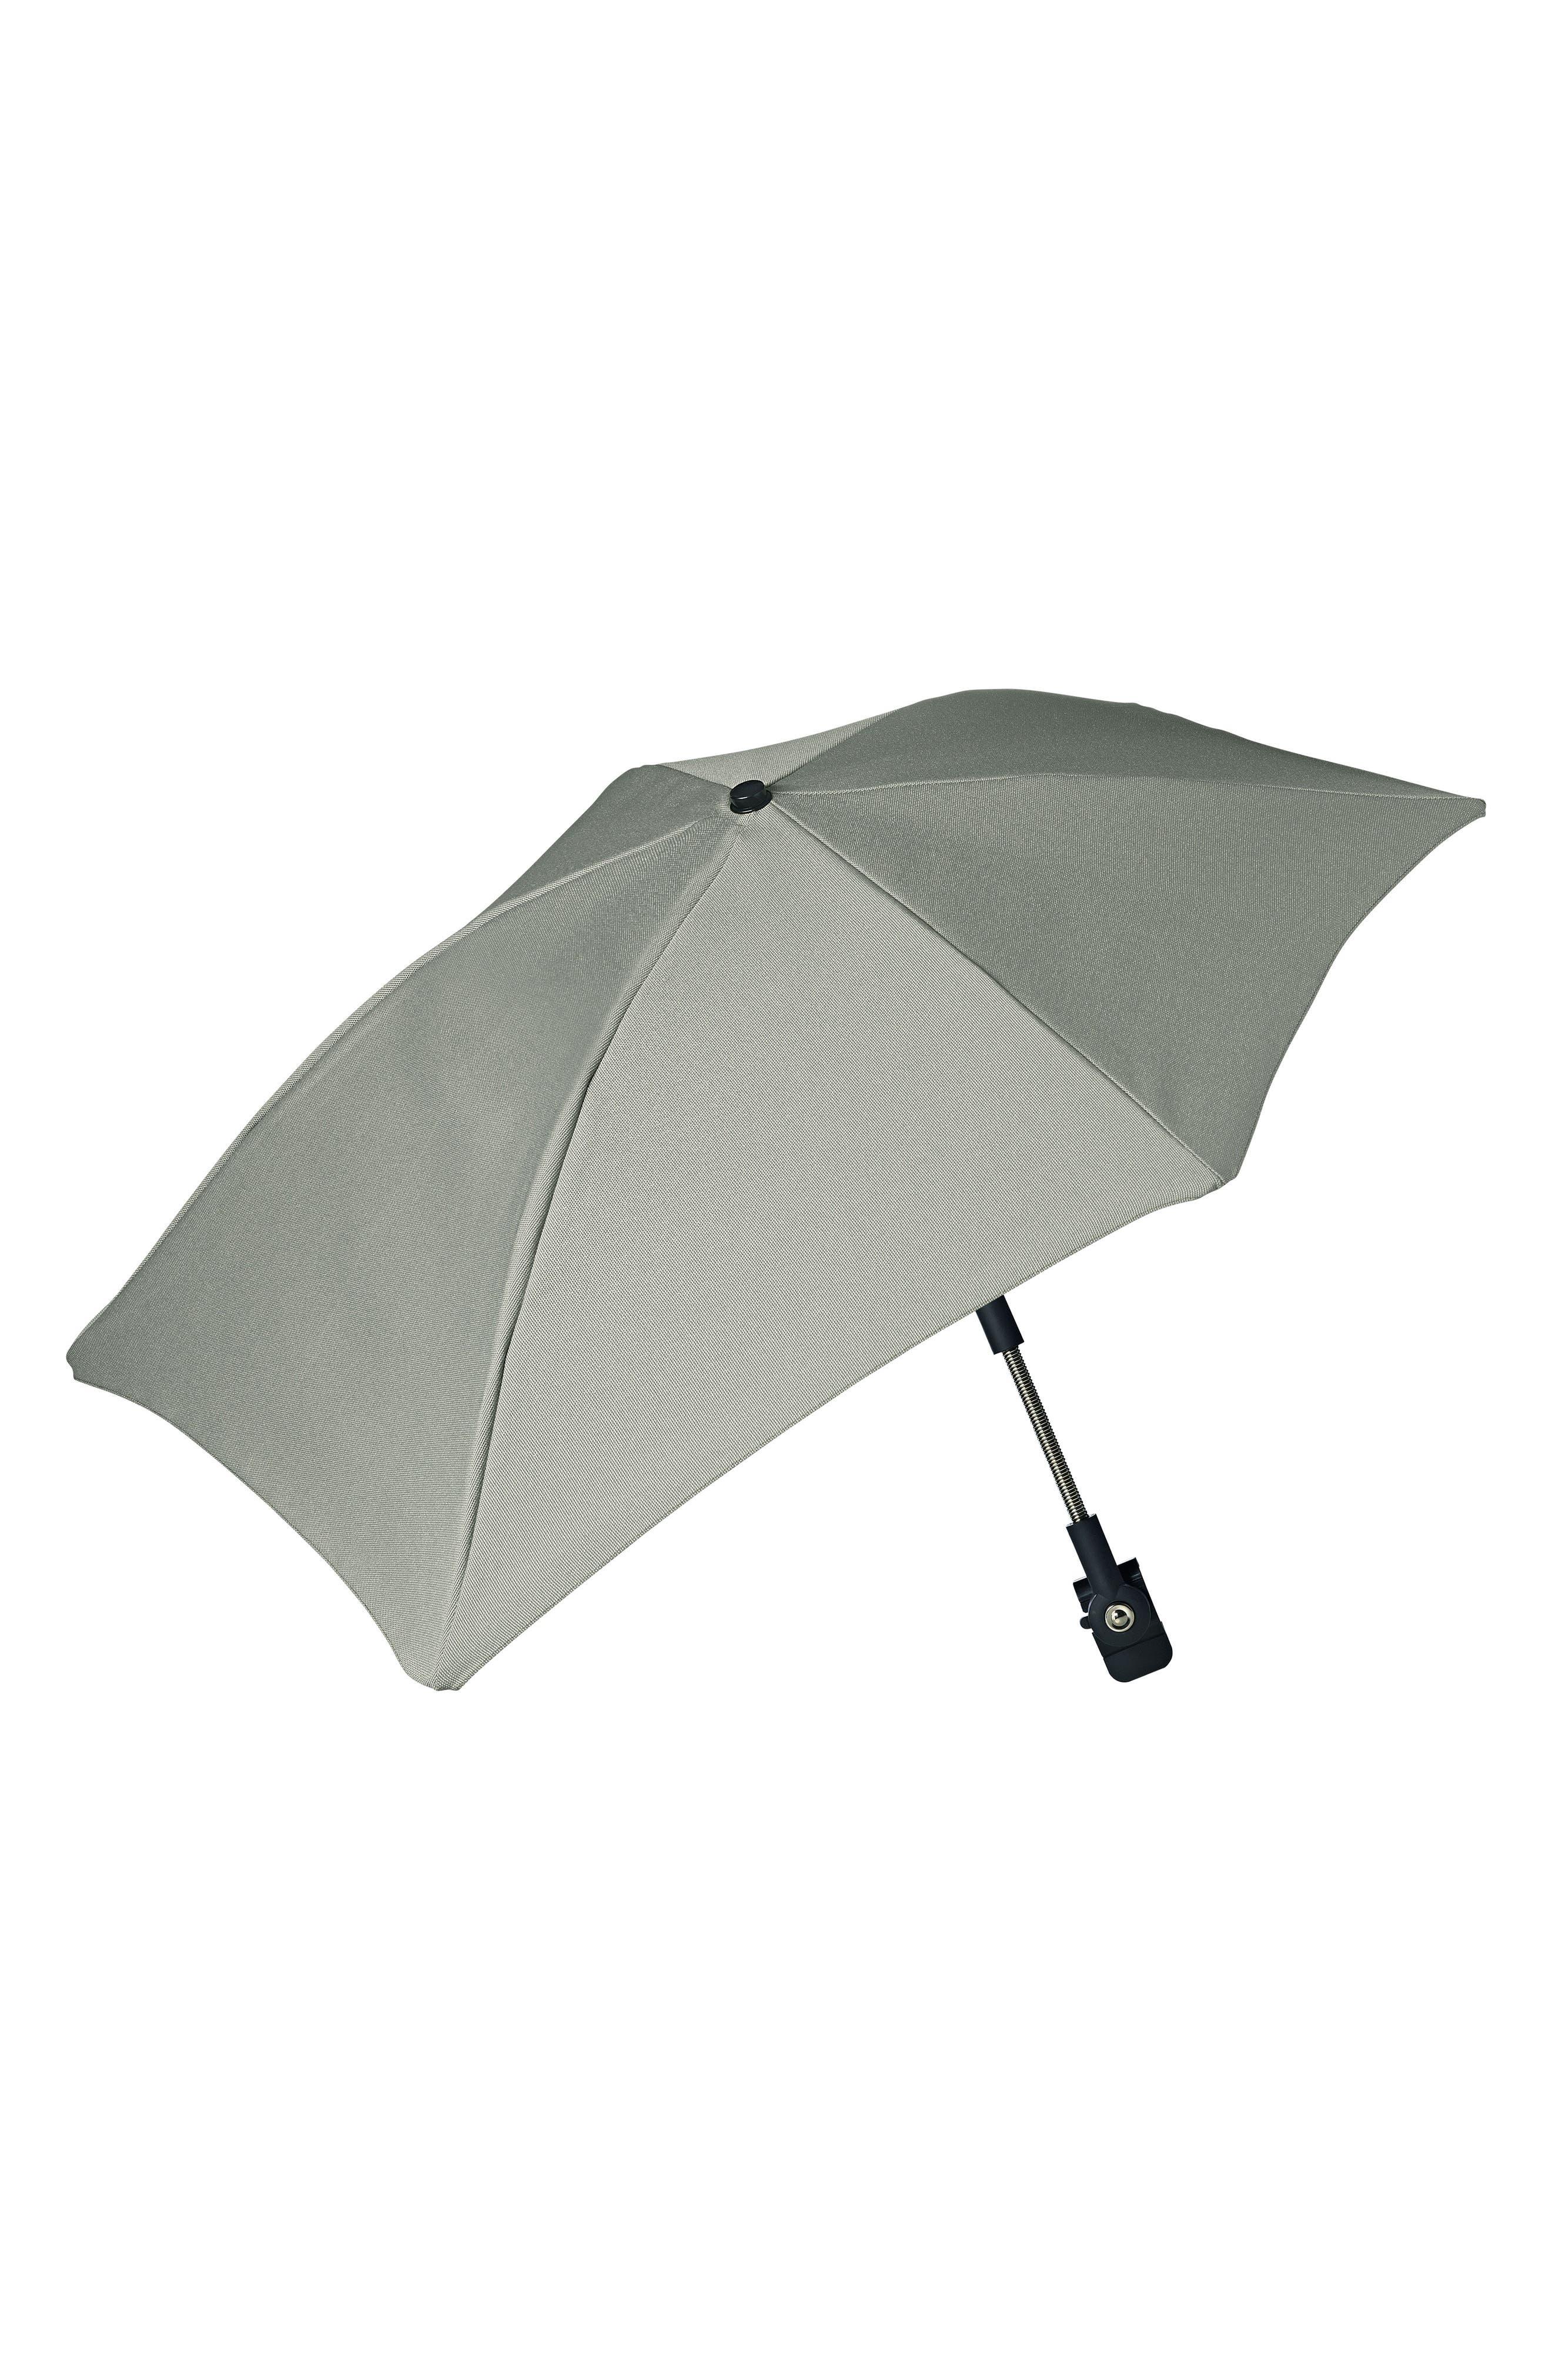 Joolz Geo2 Stroller Parasol